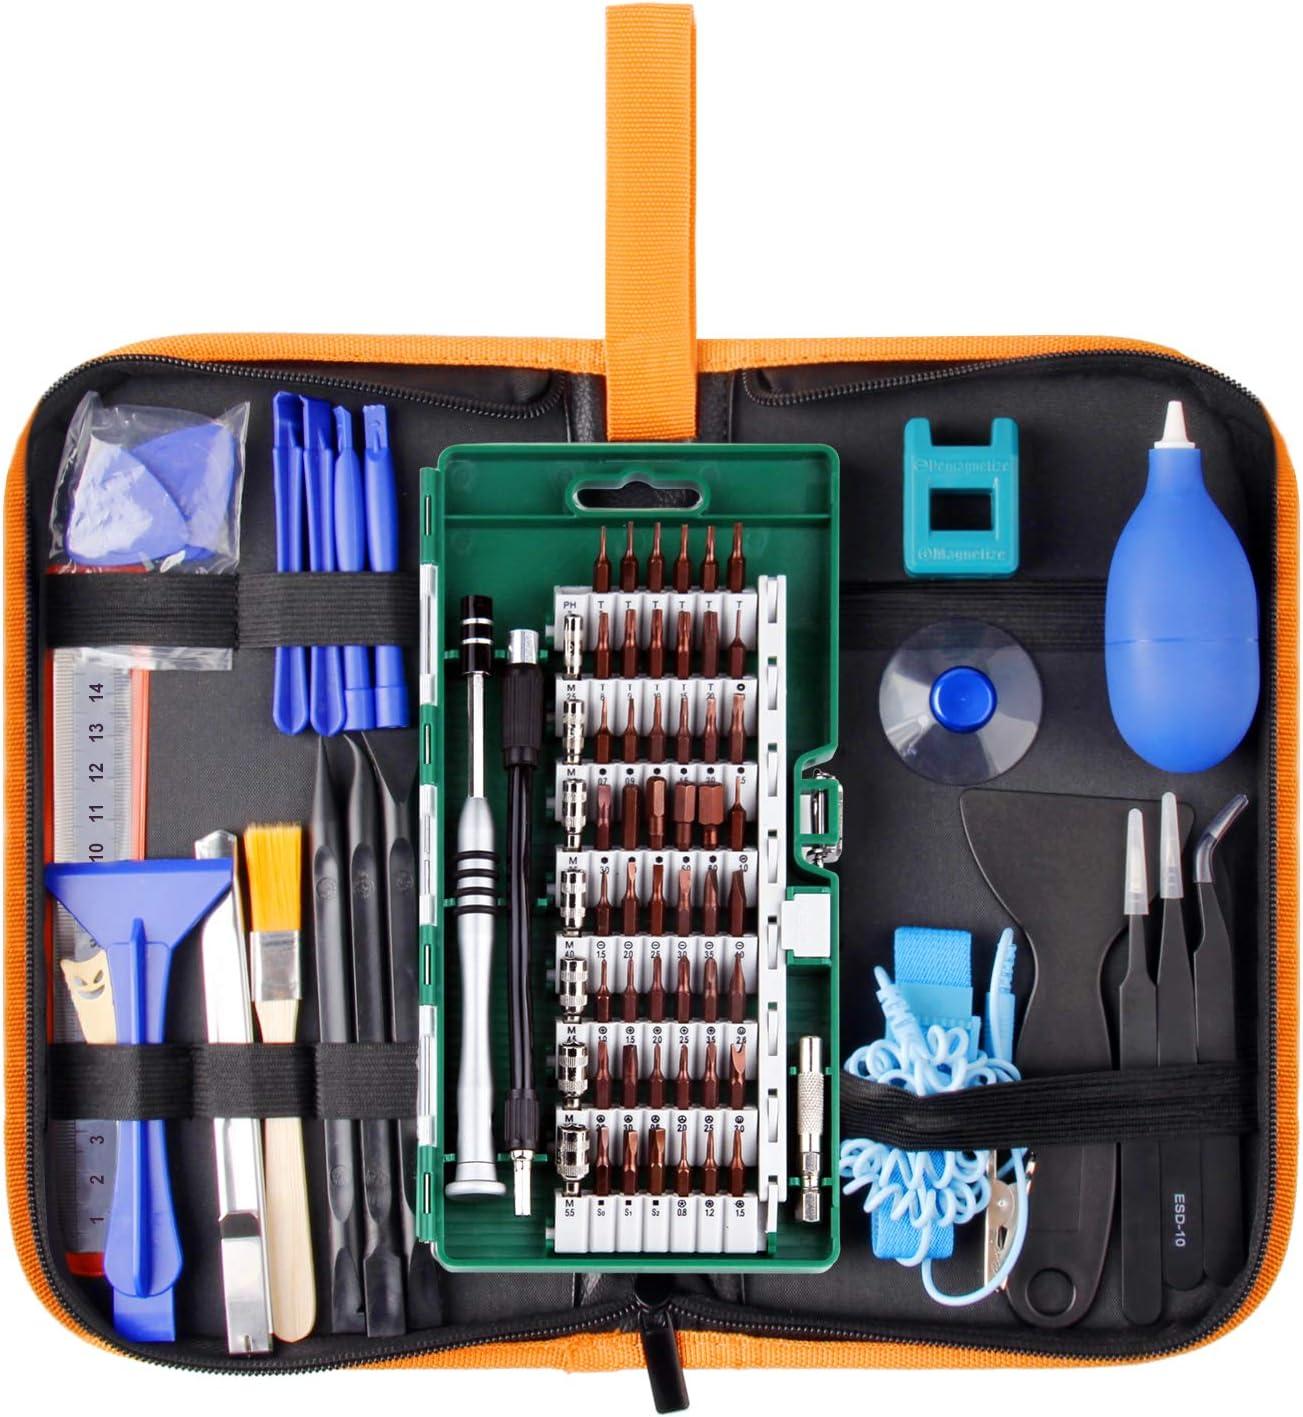 12pcs Precision Magnetic Screwdriver Set kit For Iphone Android Repair Tool Kit